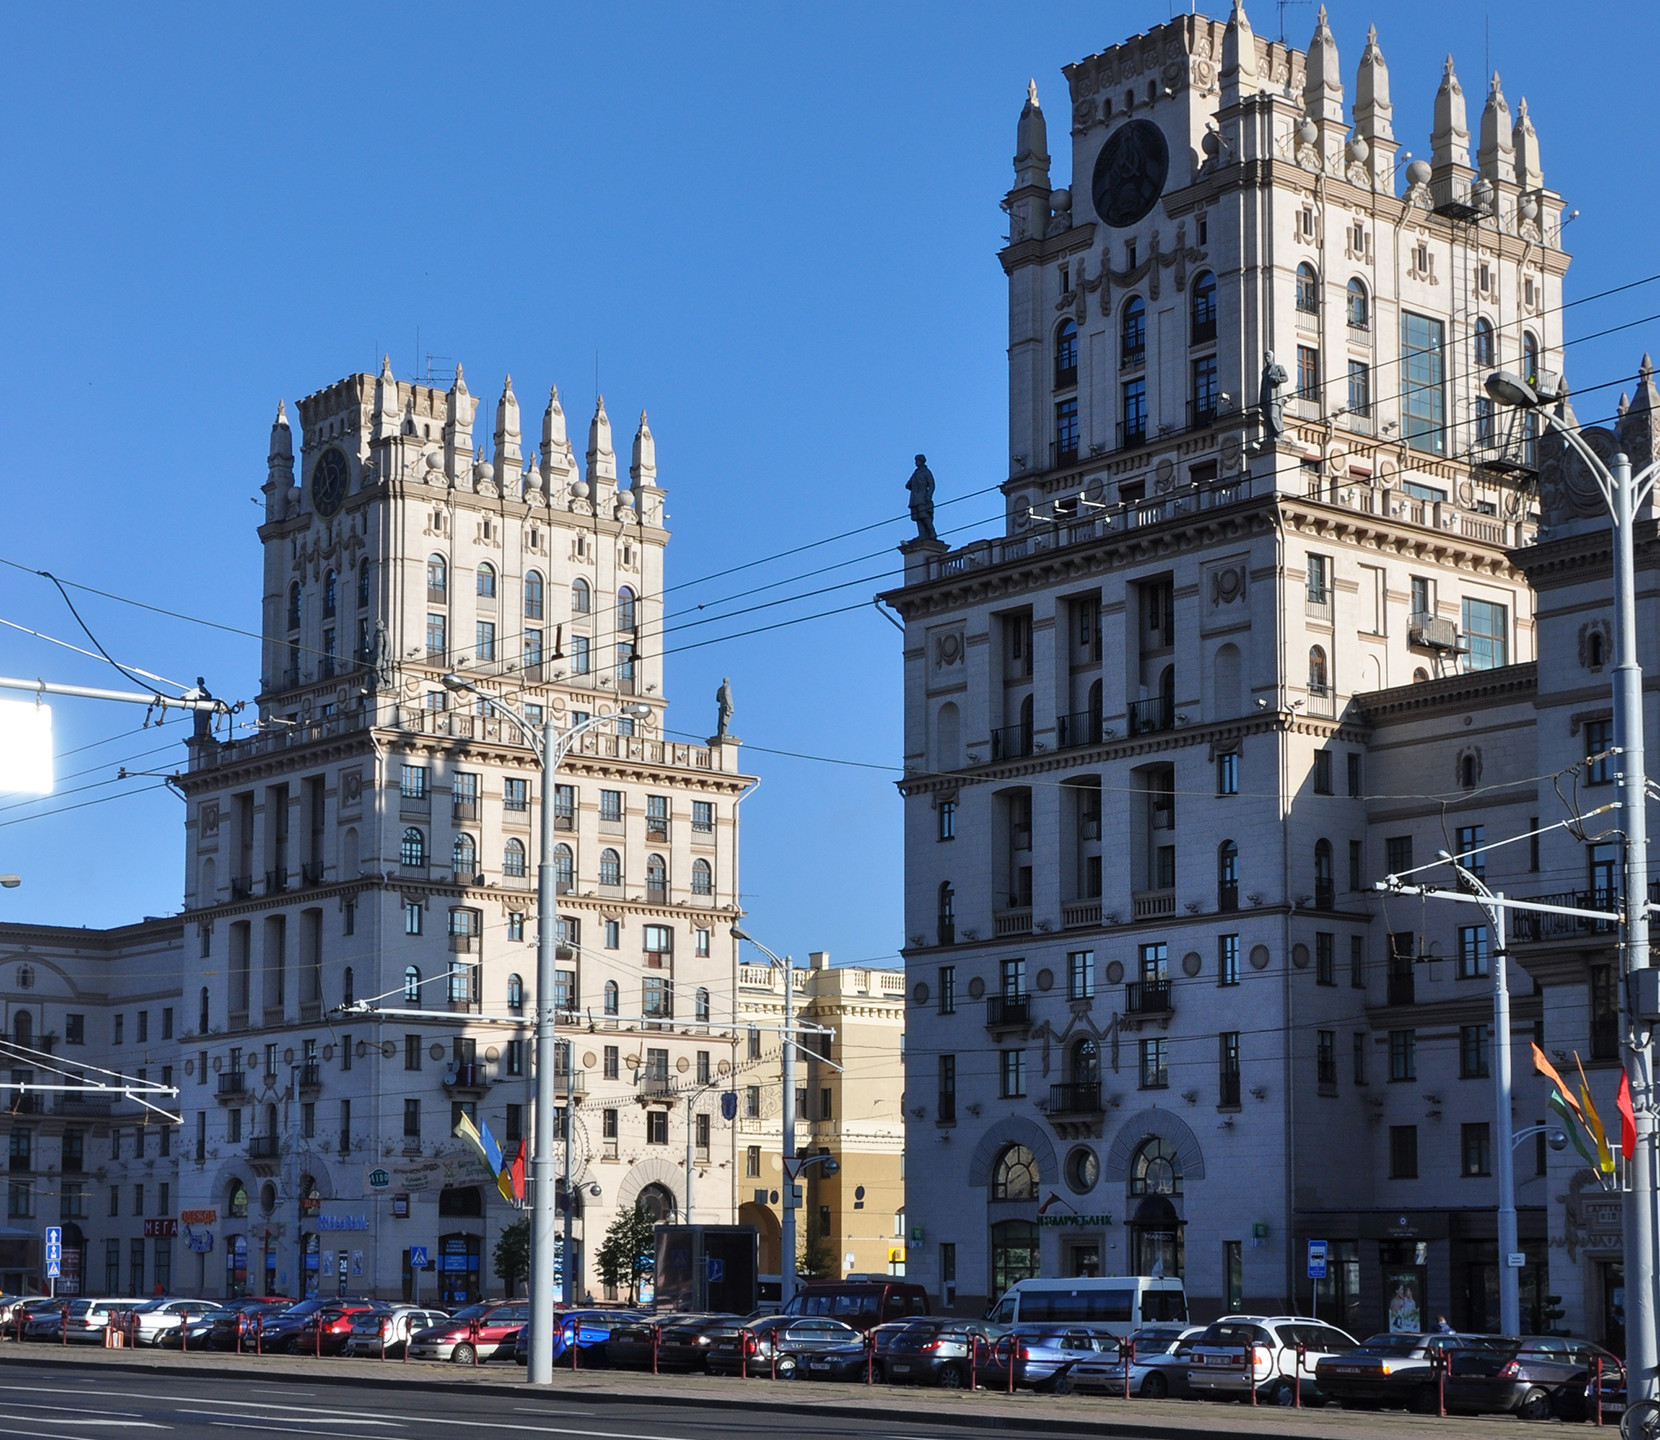 Символ Минска башни-ворота на привокзальной площади